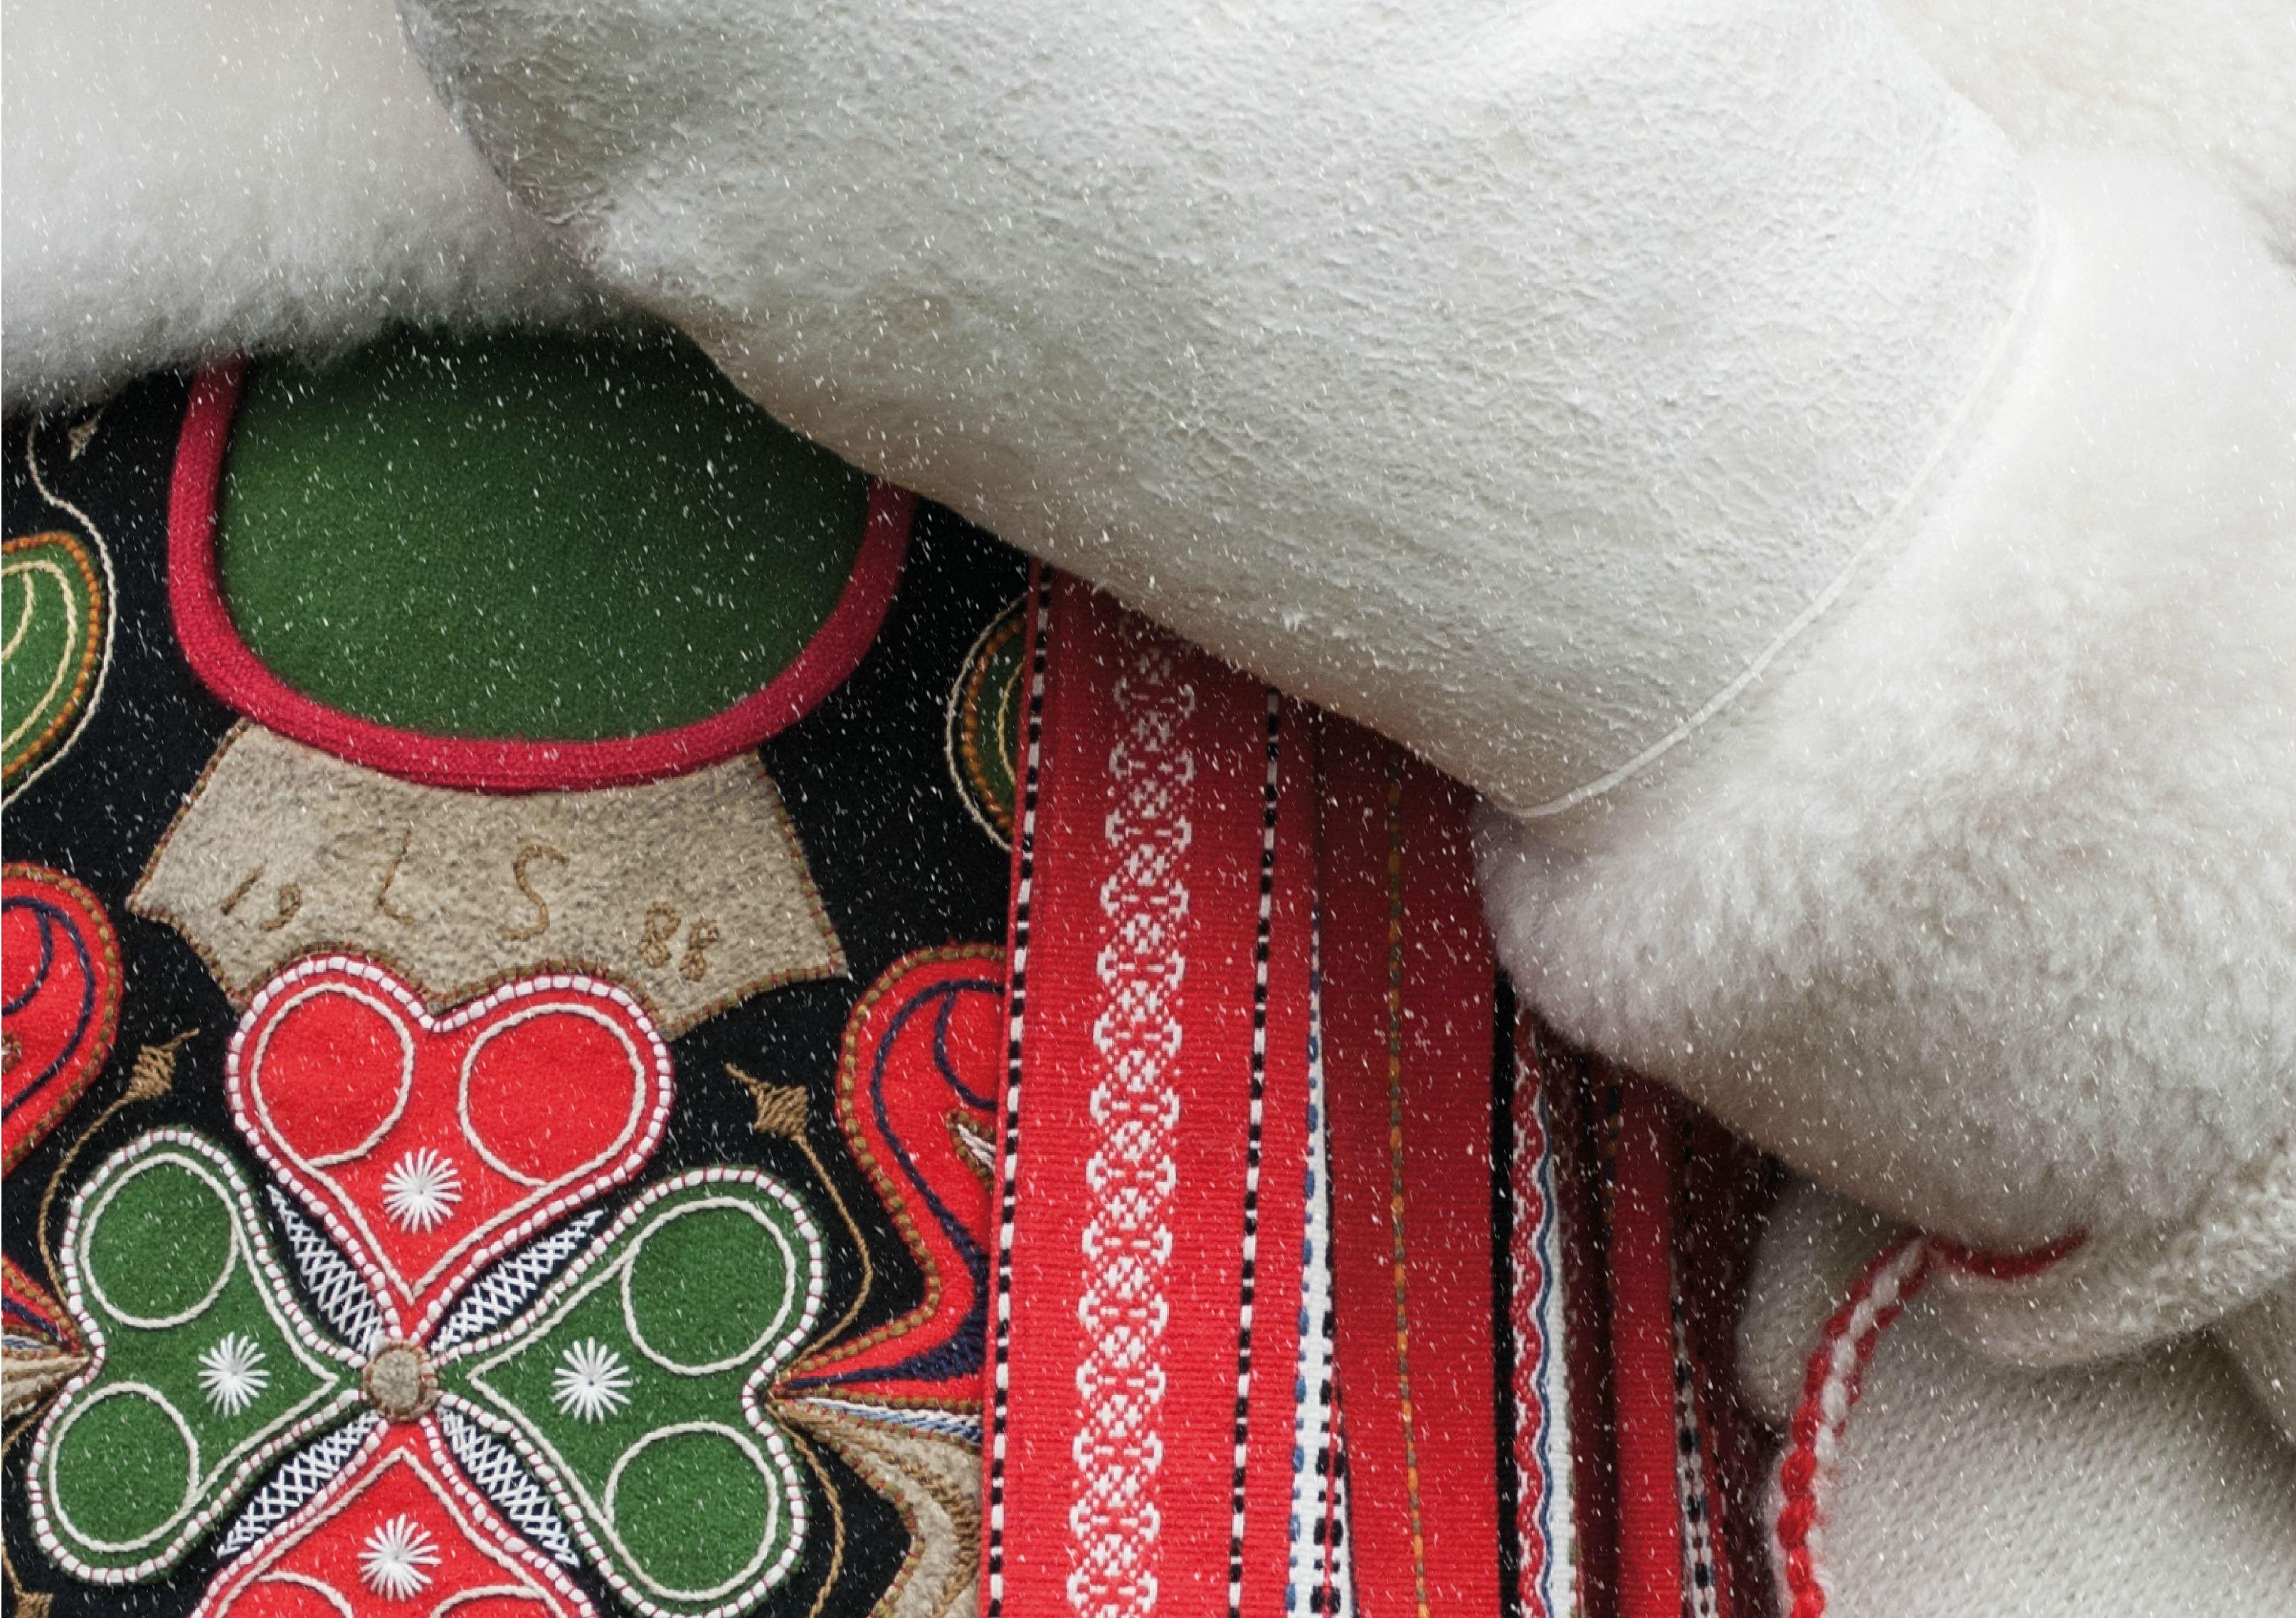 Leksands Julmarknad